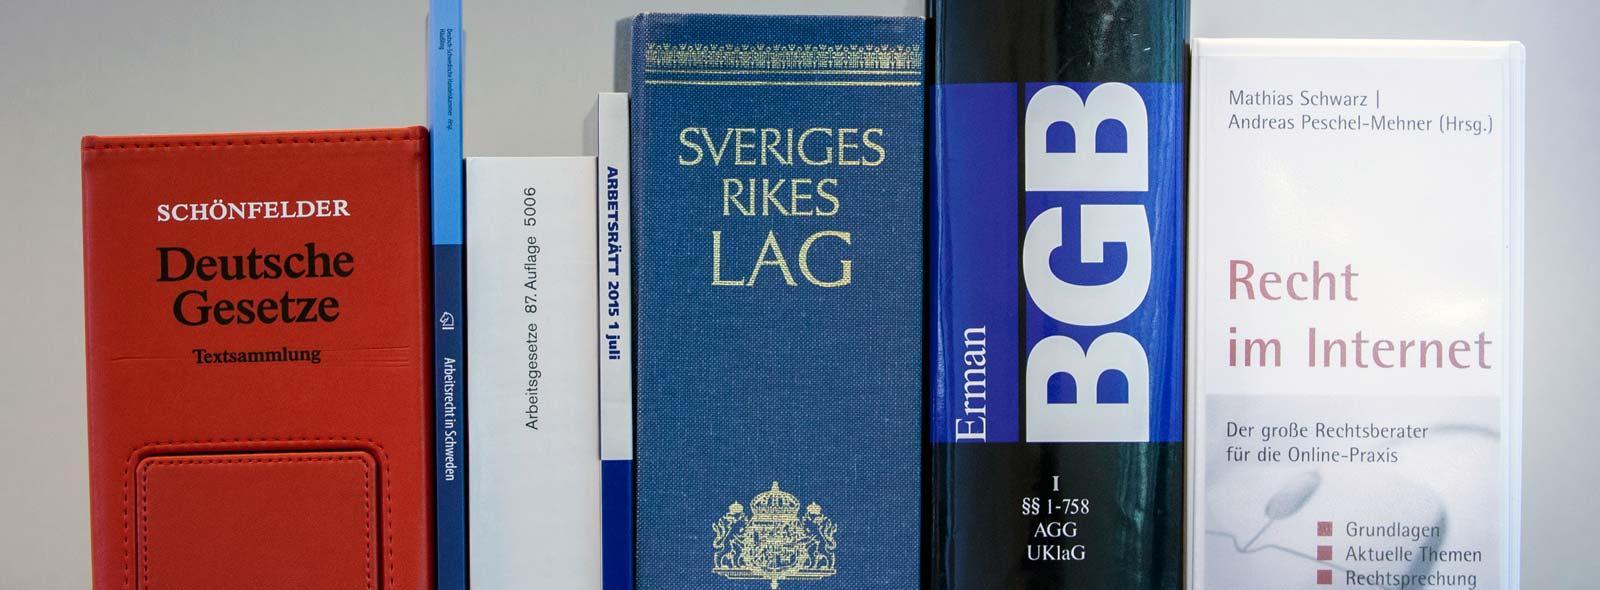 Recht Deutsch Schwedische Handelskammer